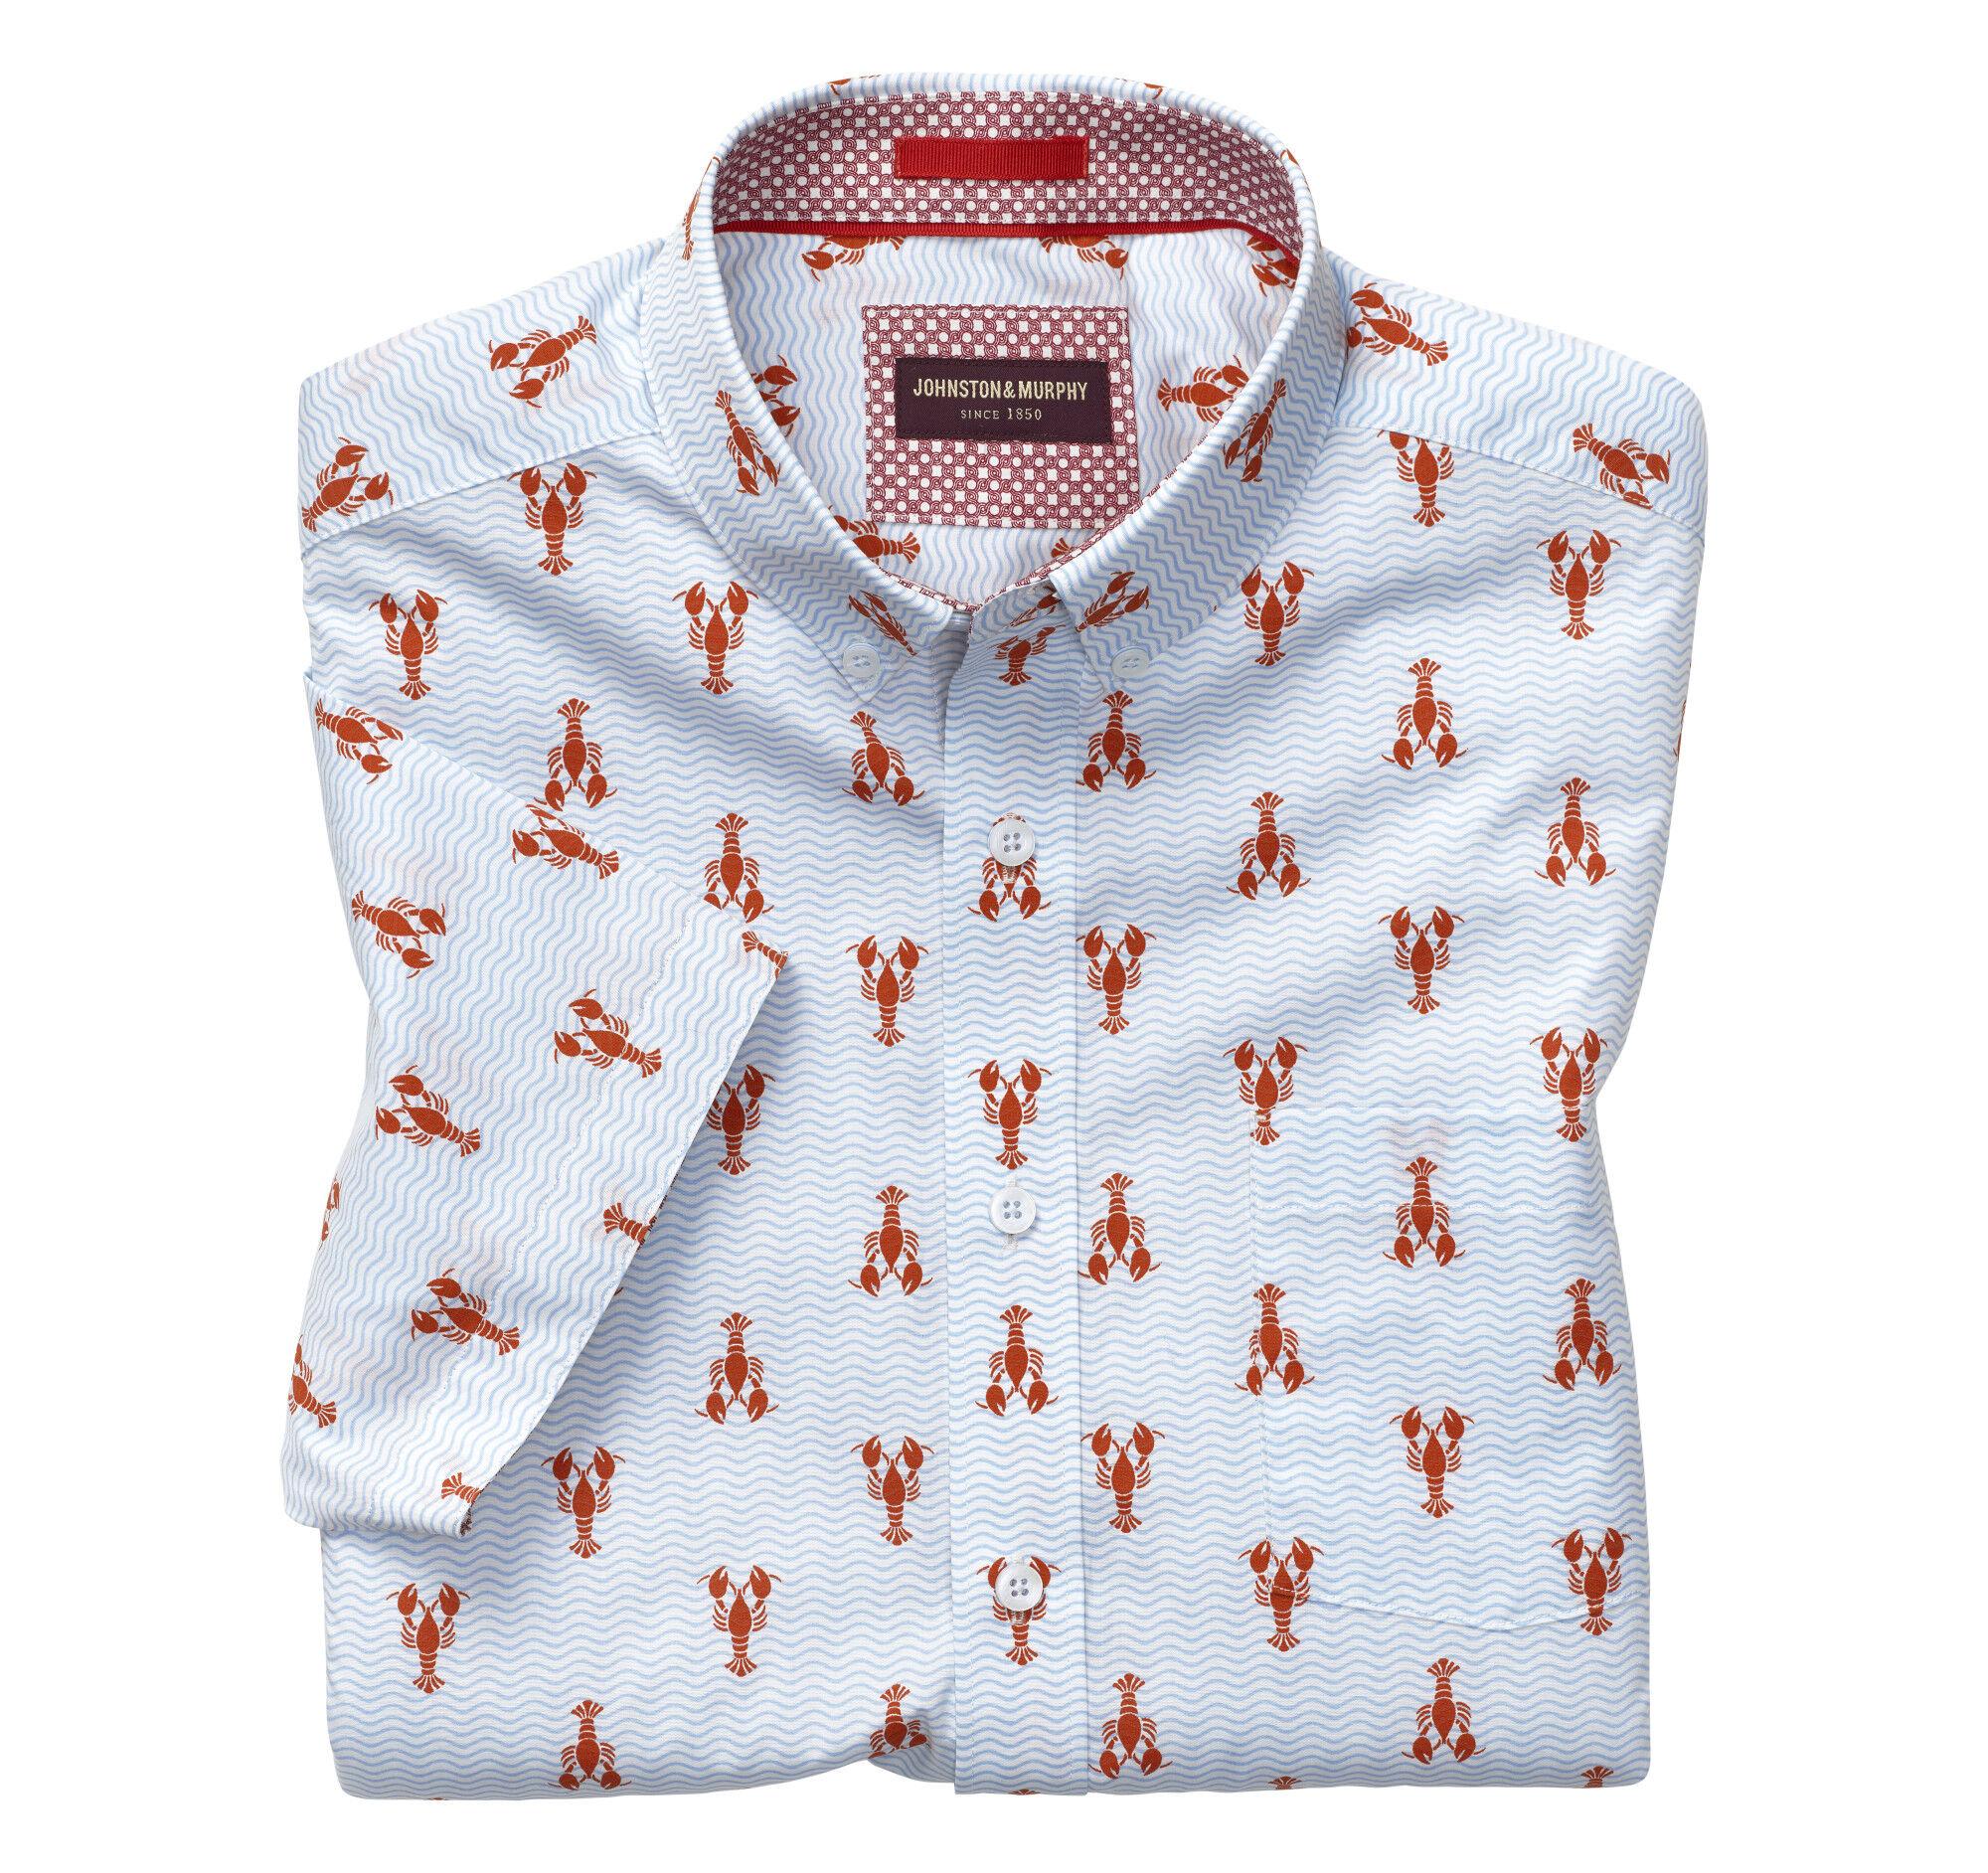 8c9eacb78 Lobster Print Short-Sleeve Shirt | Johnston & Murphy